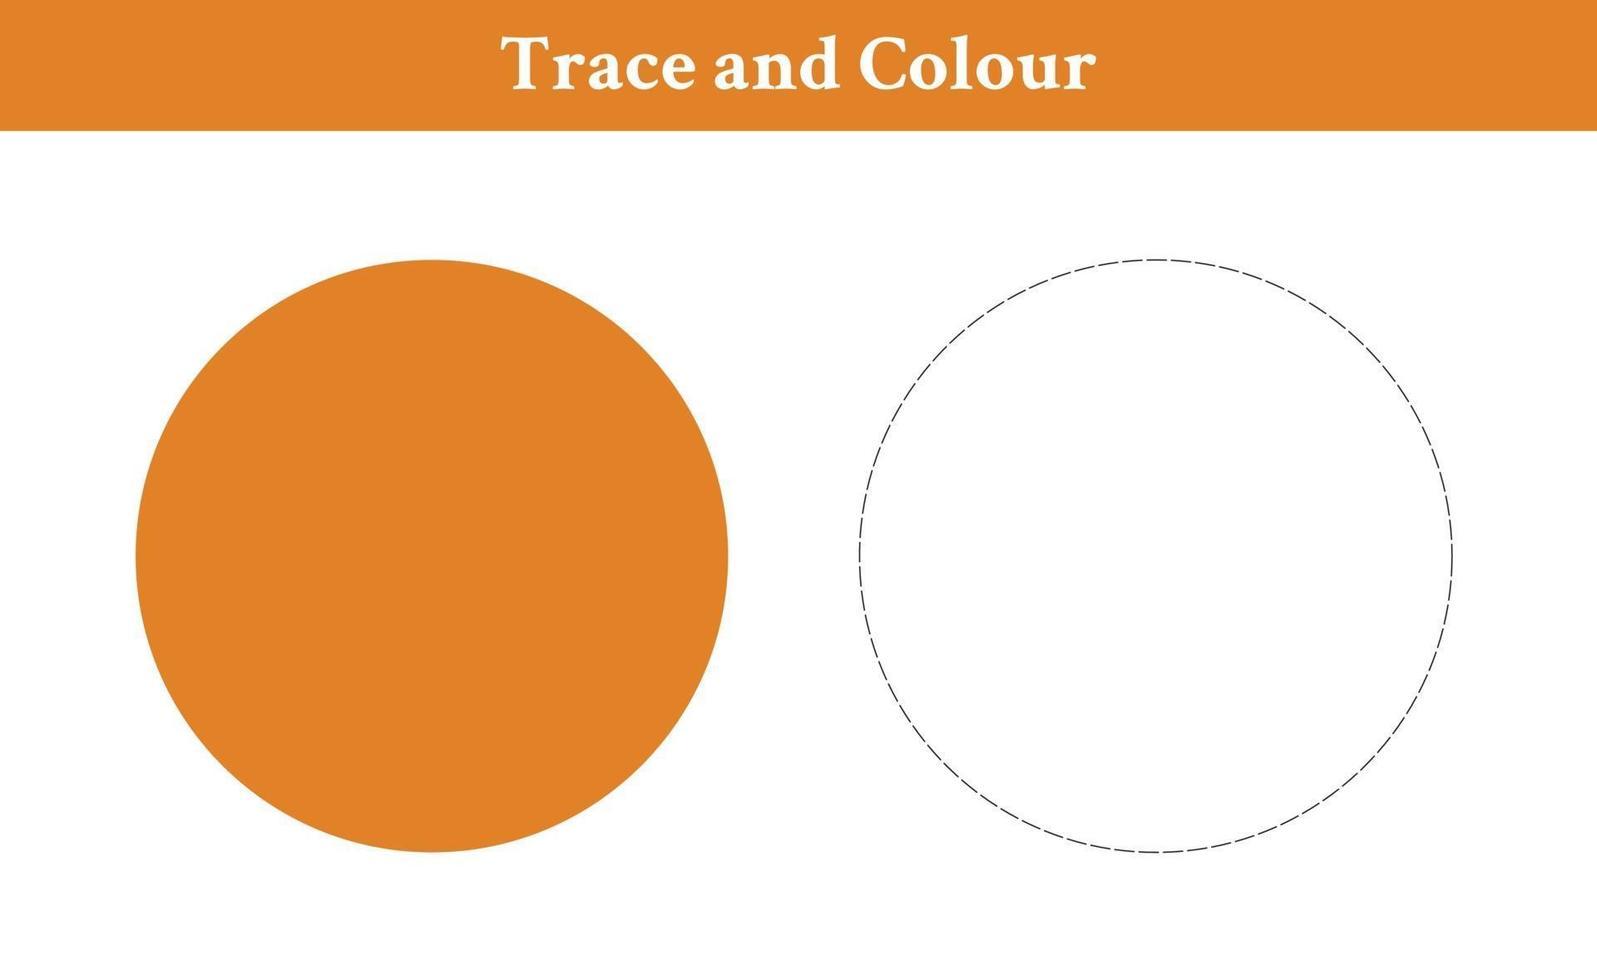 trace en kleur cirkel vrije vector